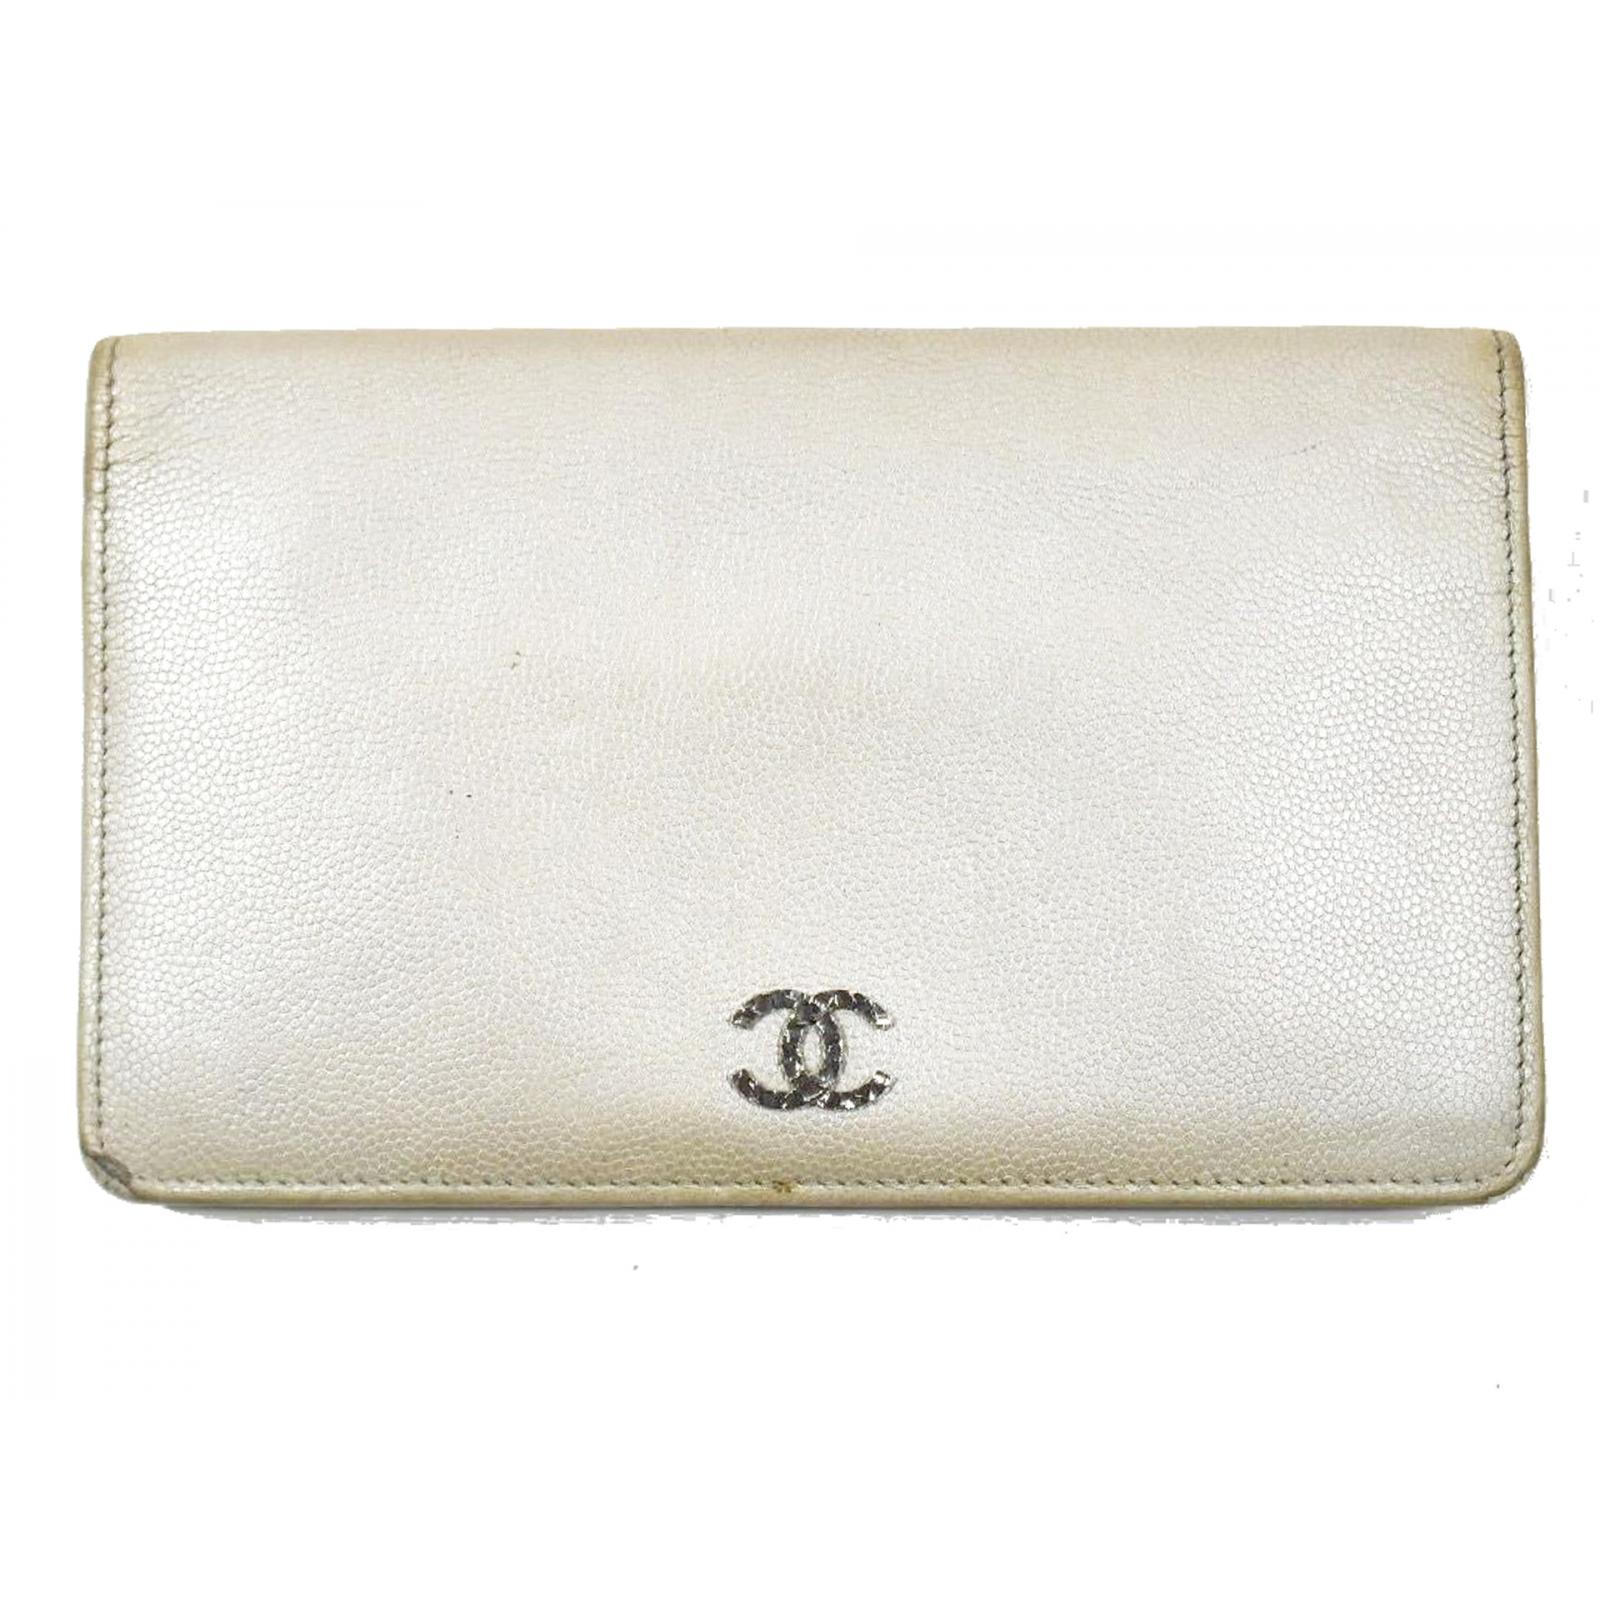 Srebrny szampan Chanel portfel